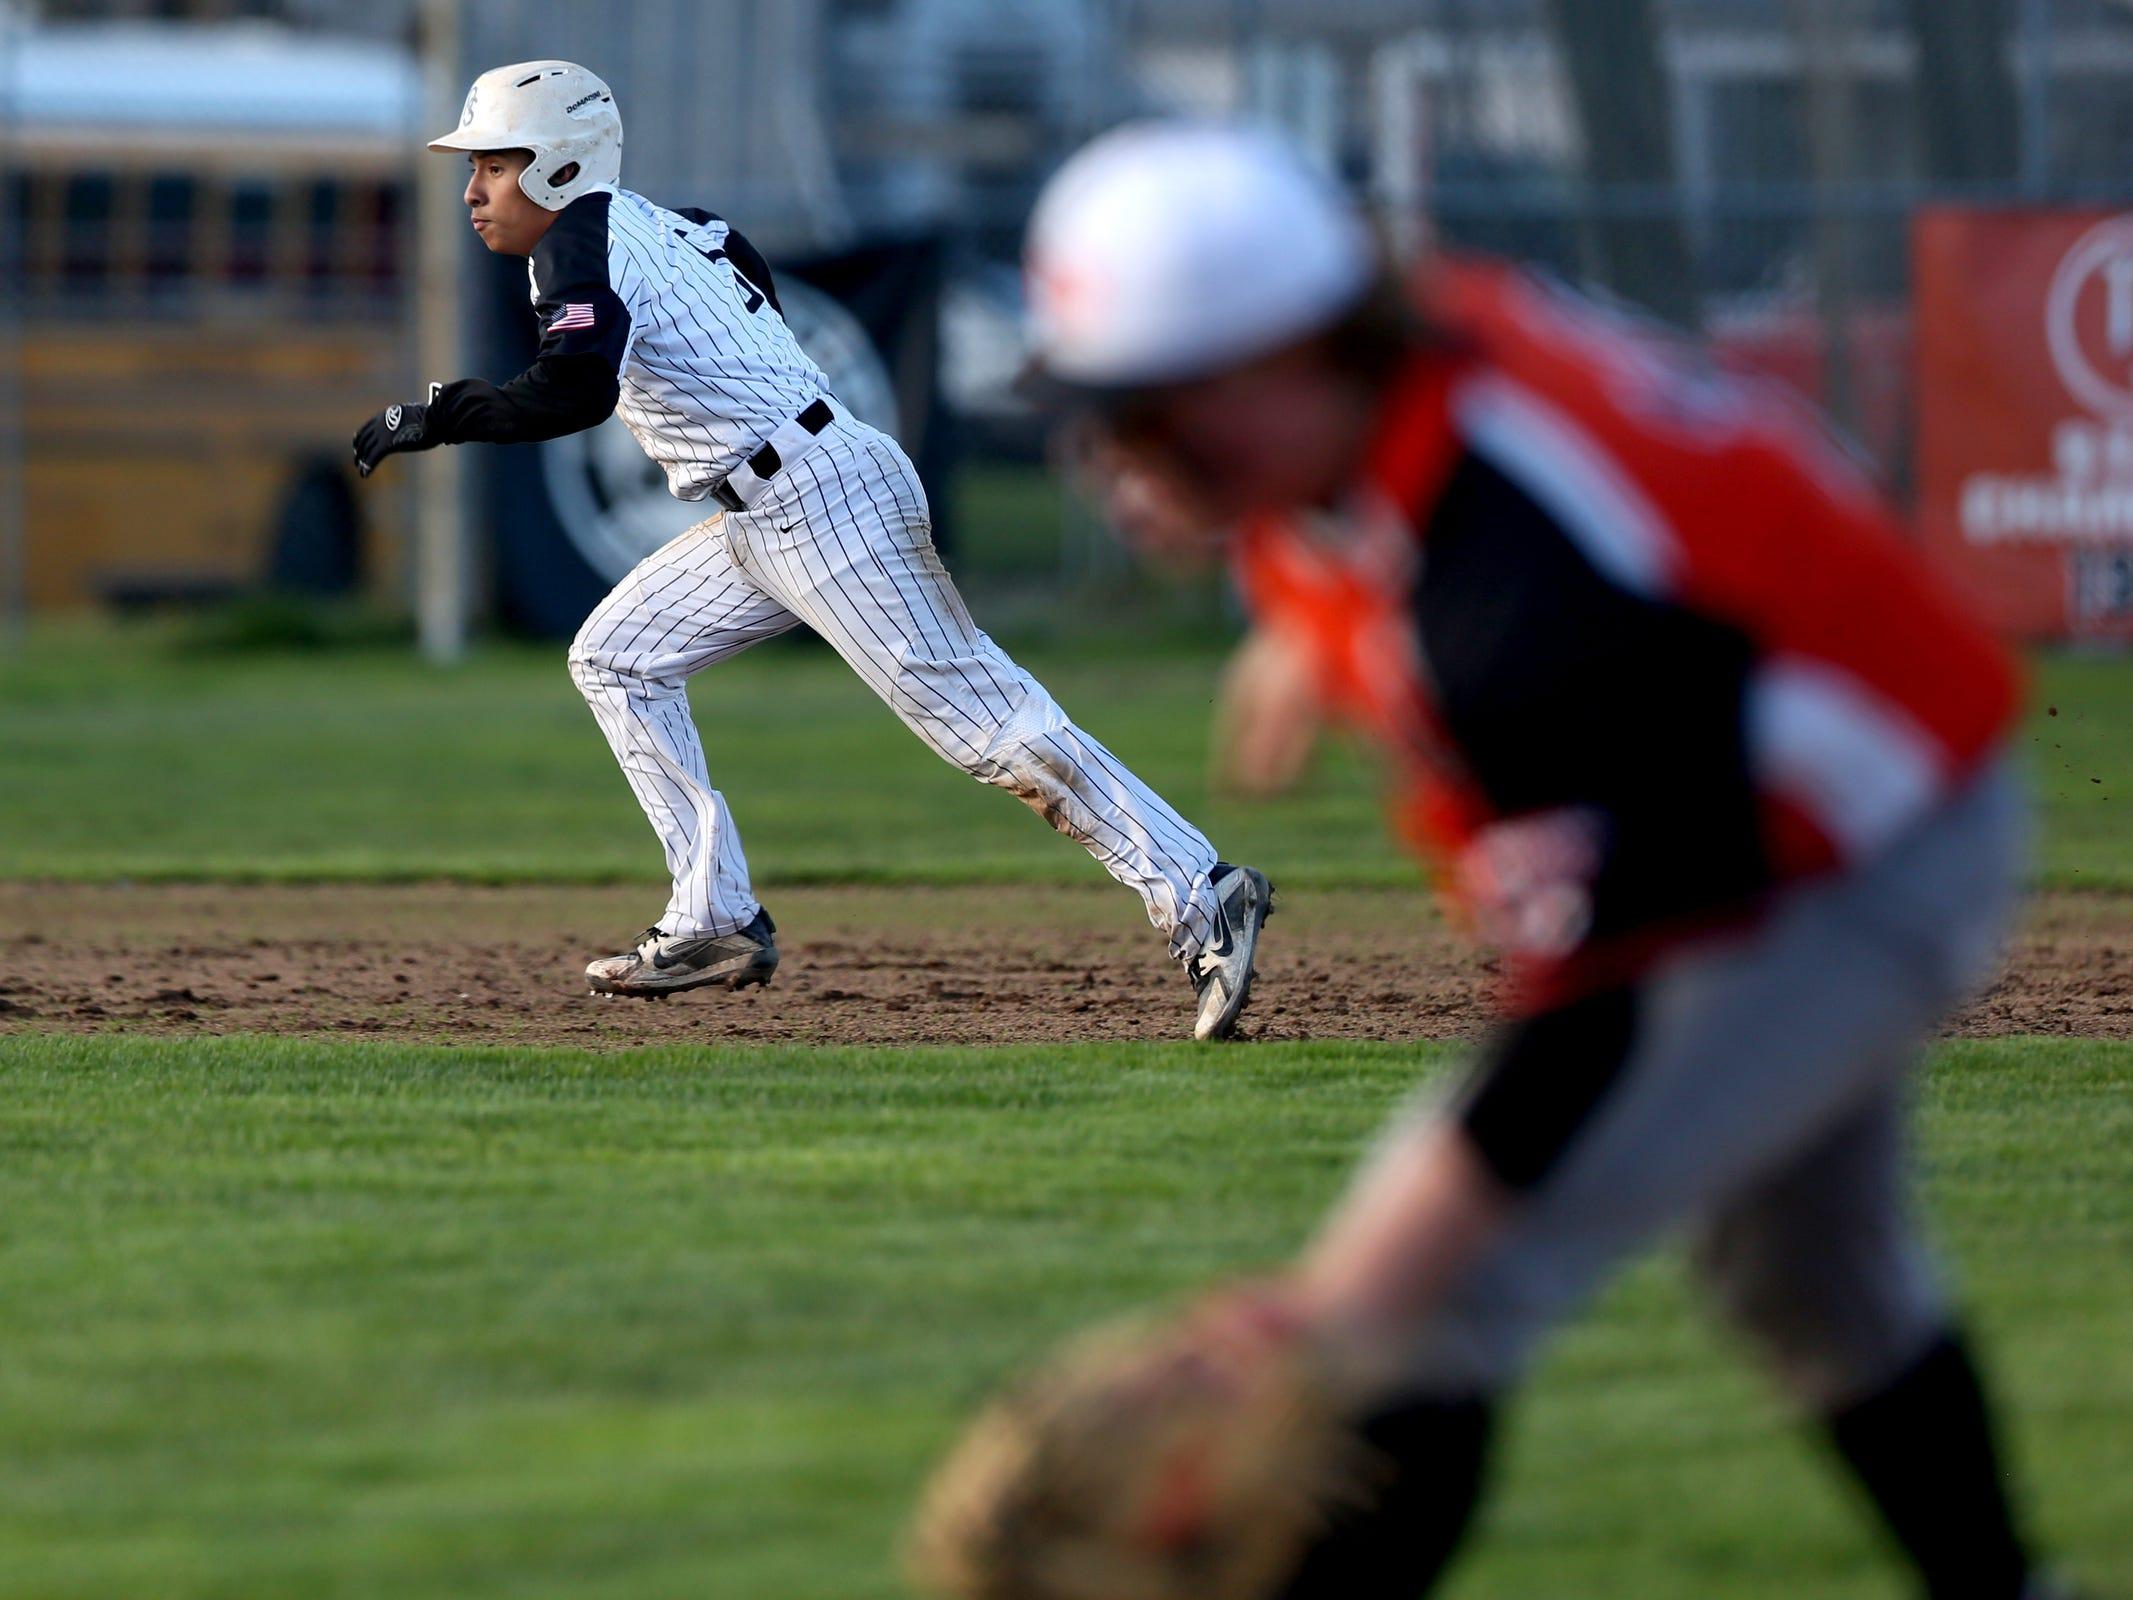 North Salem's Brian Bernal (5) runs to third in the Dallas vs. North Salem baseball game in Salem on April 12, 2019.